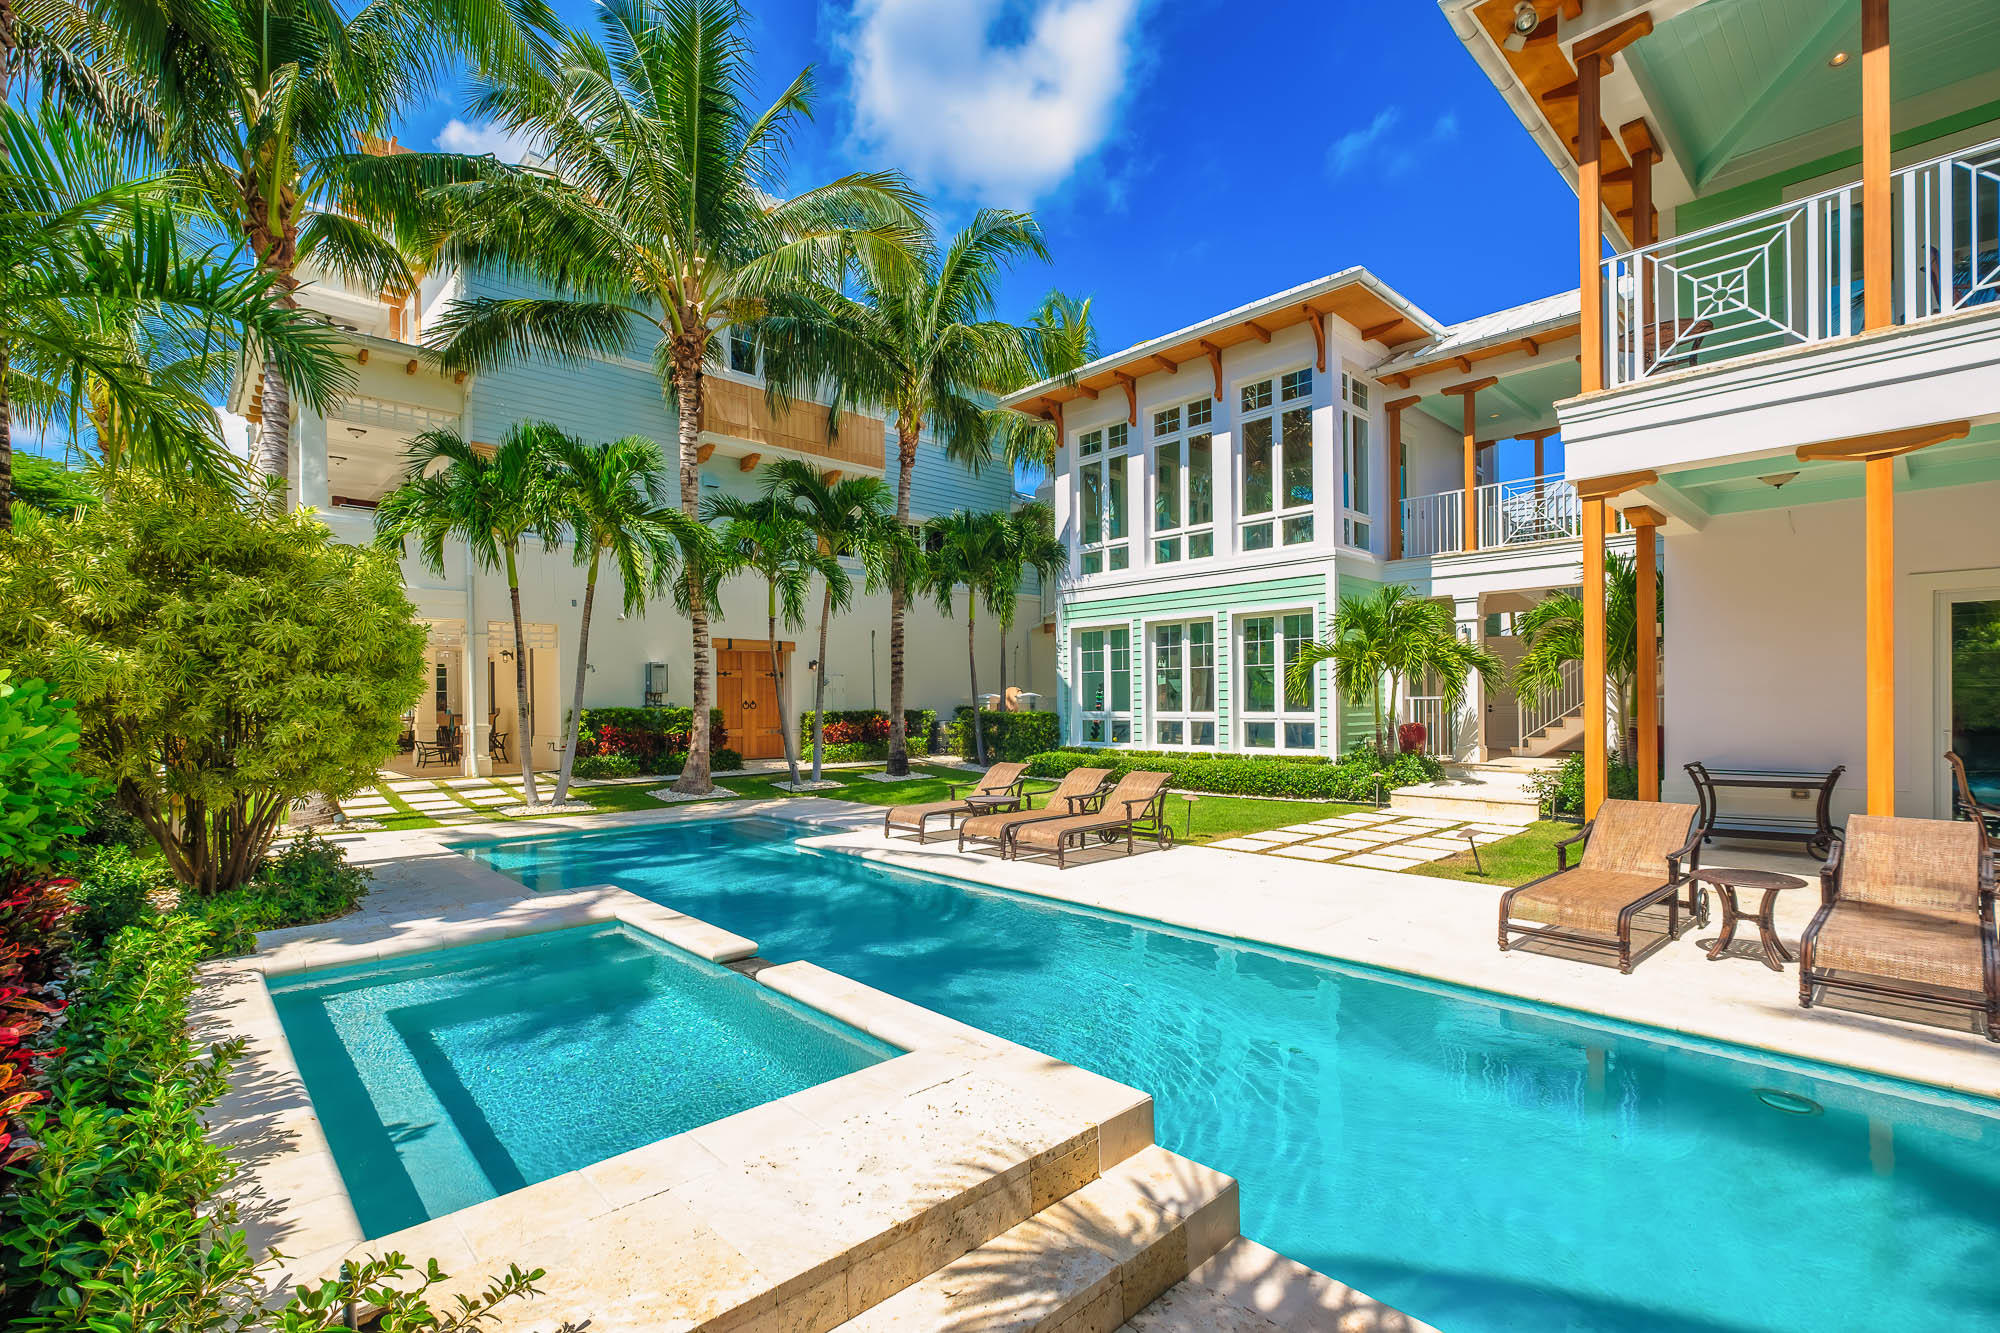 950 Lago Mar Lane, Boca Raton, FL 33431